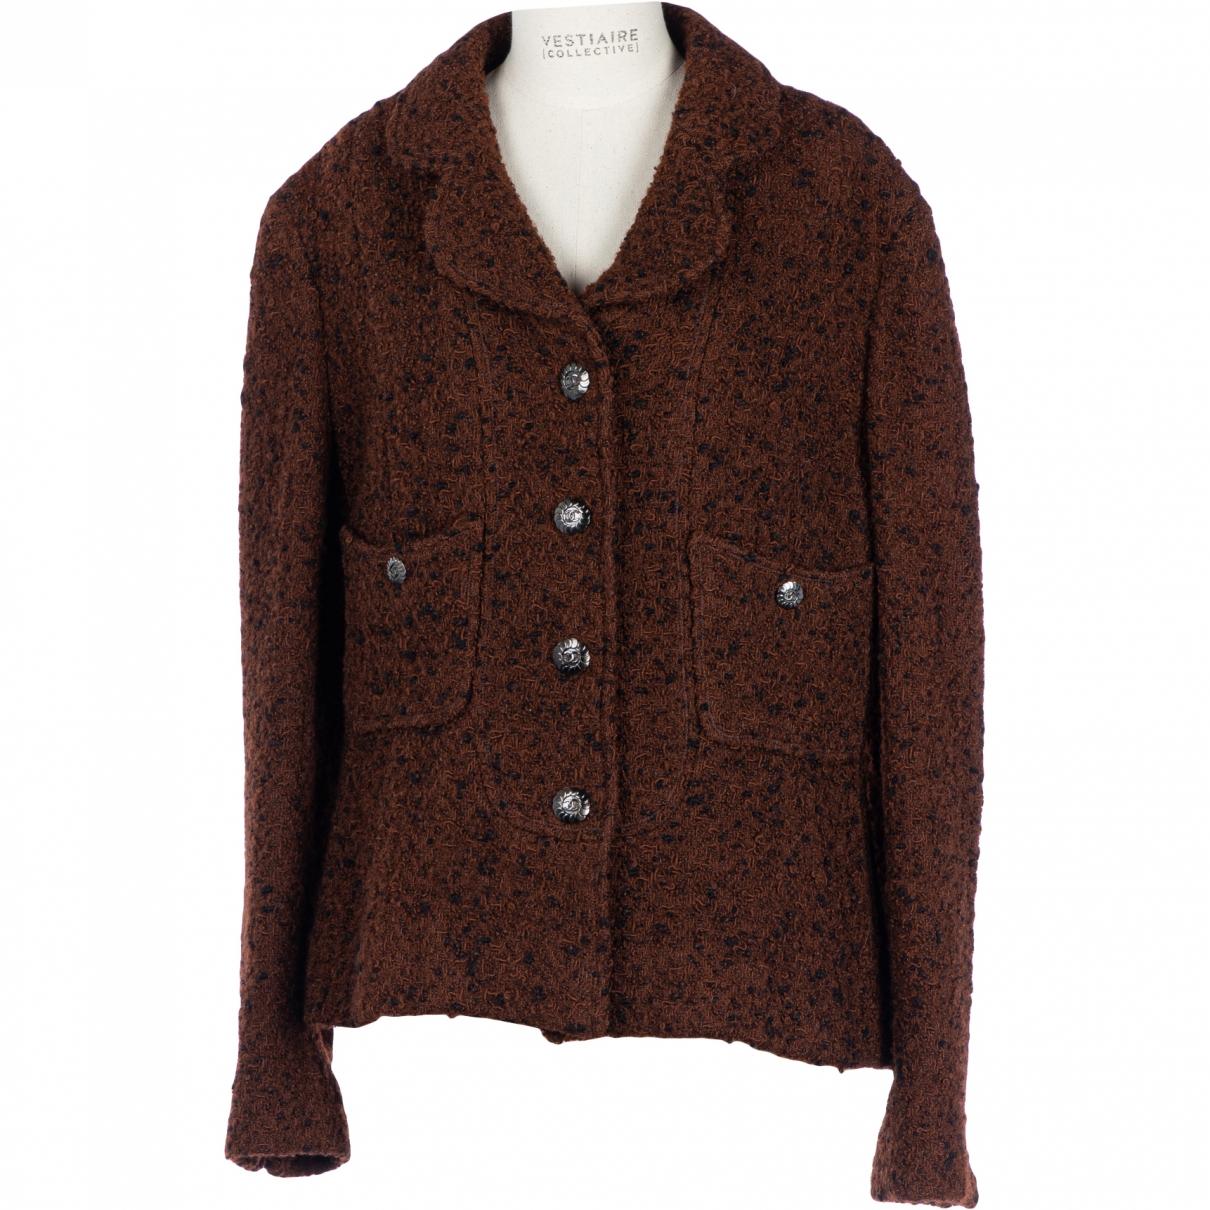 Chanel \N Brown Wool jacket for Women 44 FR